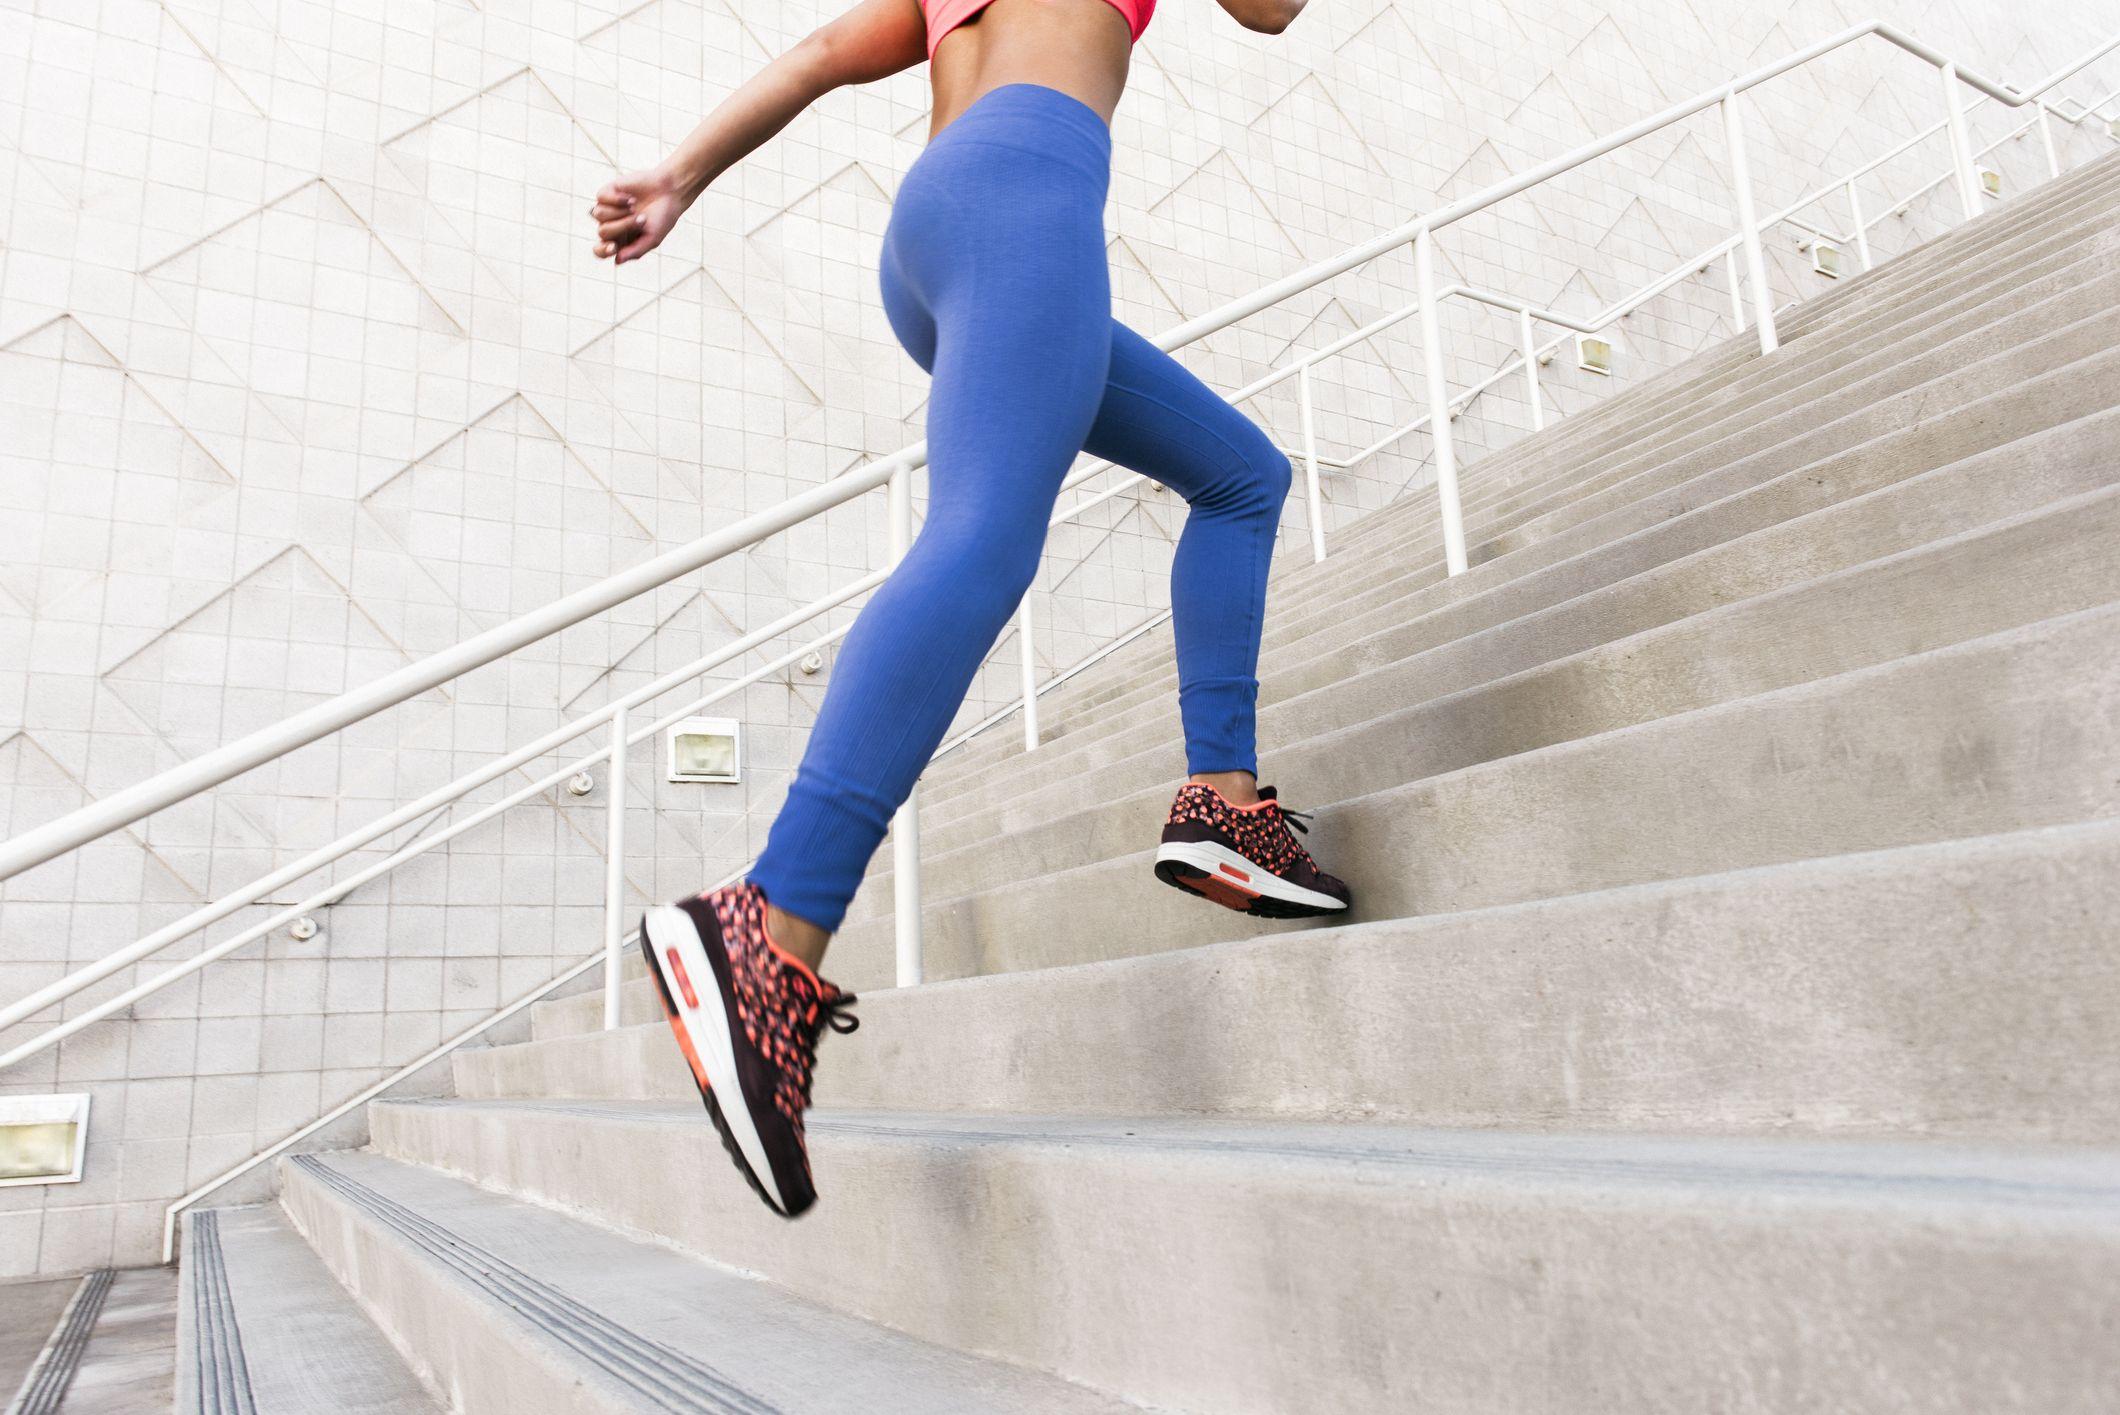 adelgazar corriendo 20 minutos de cardio en casa